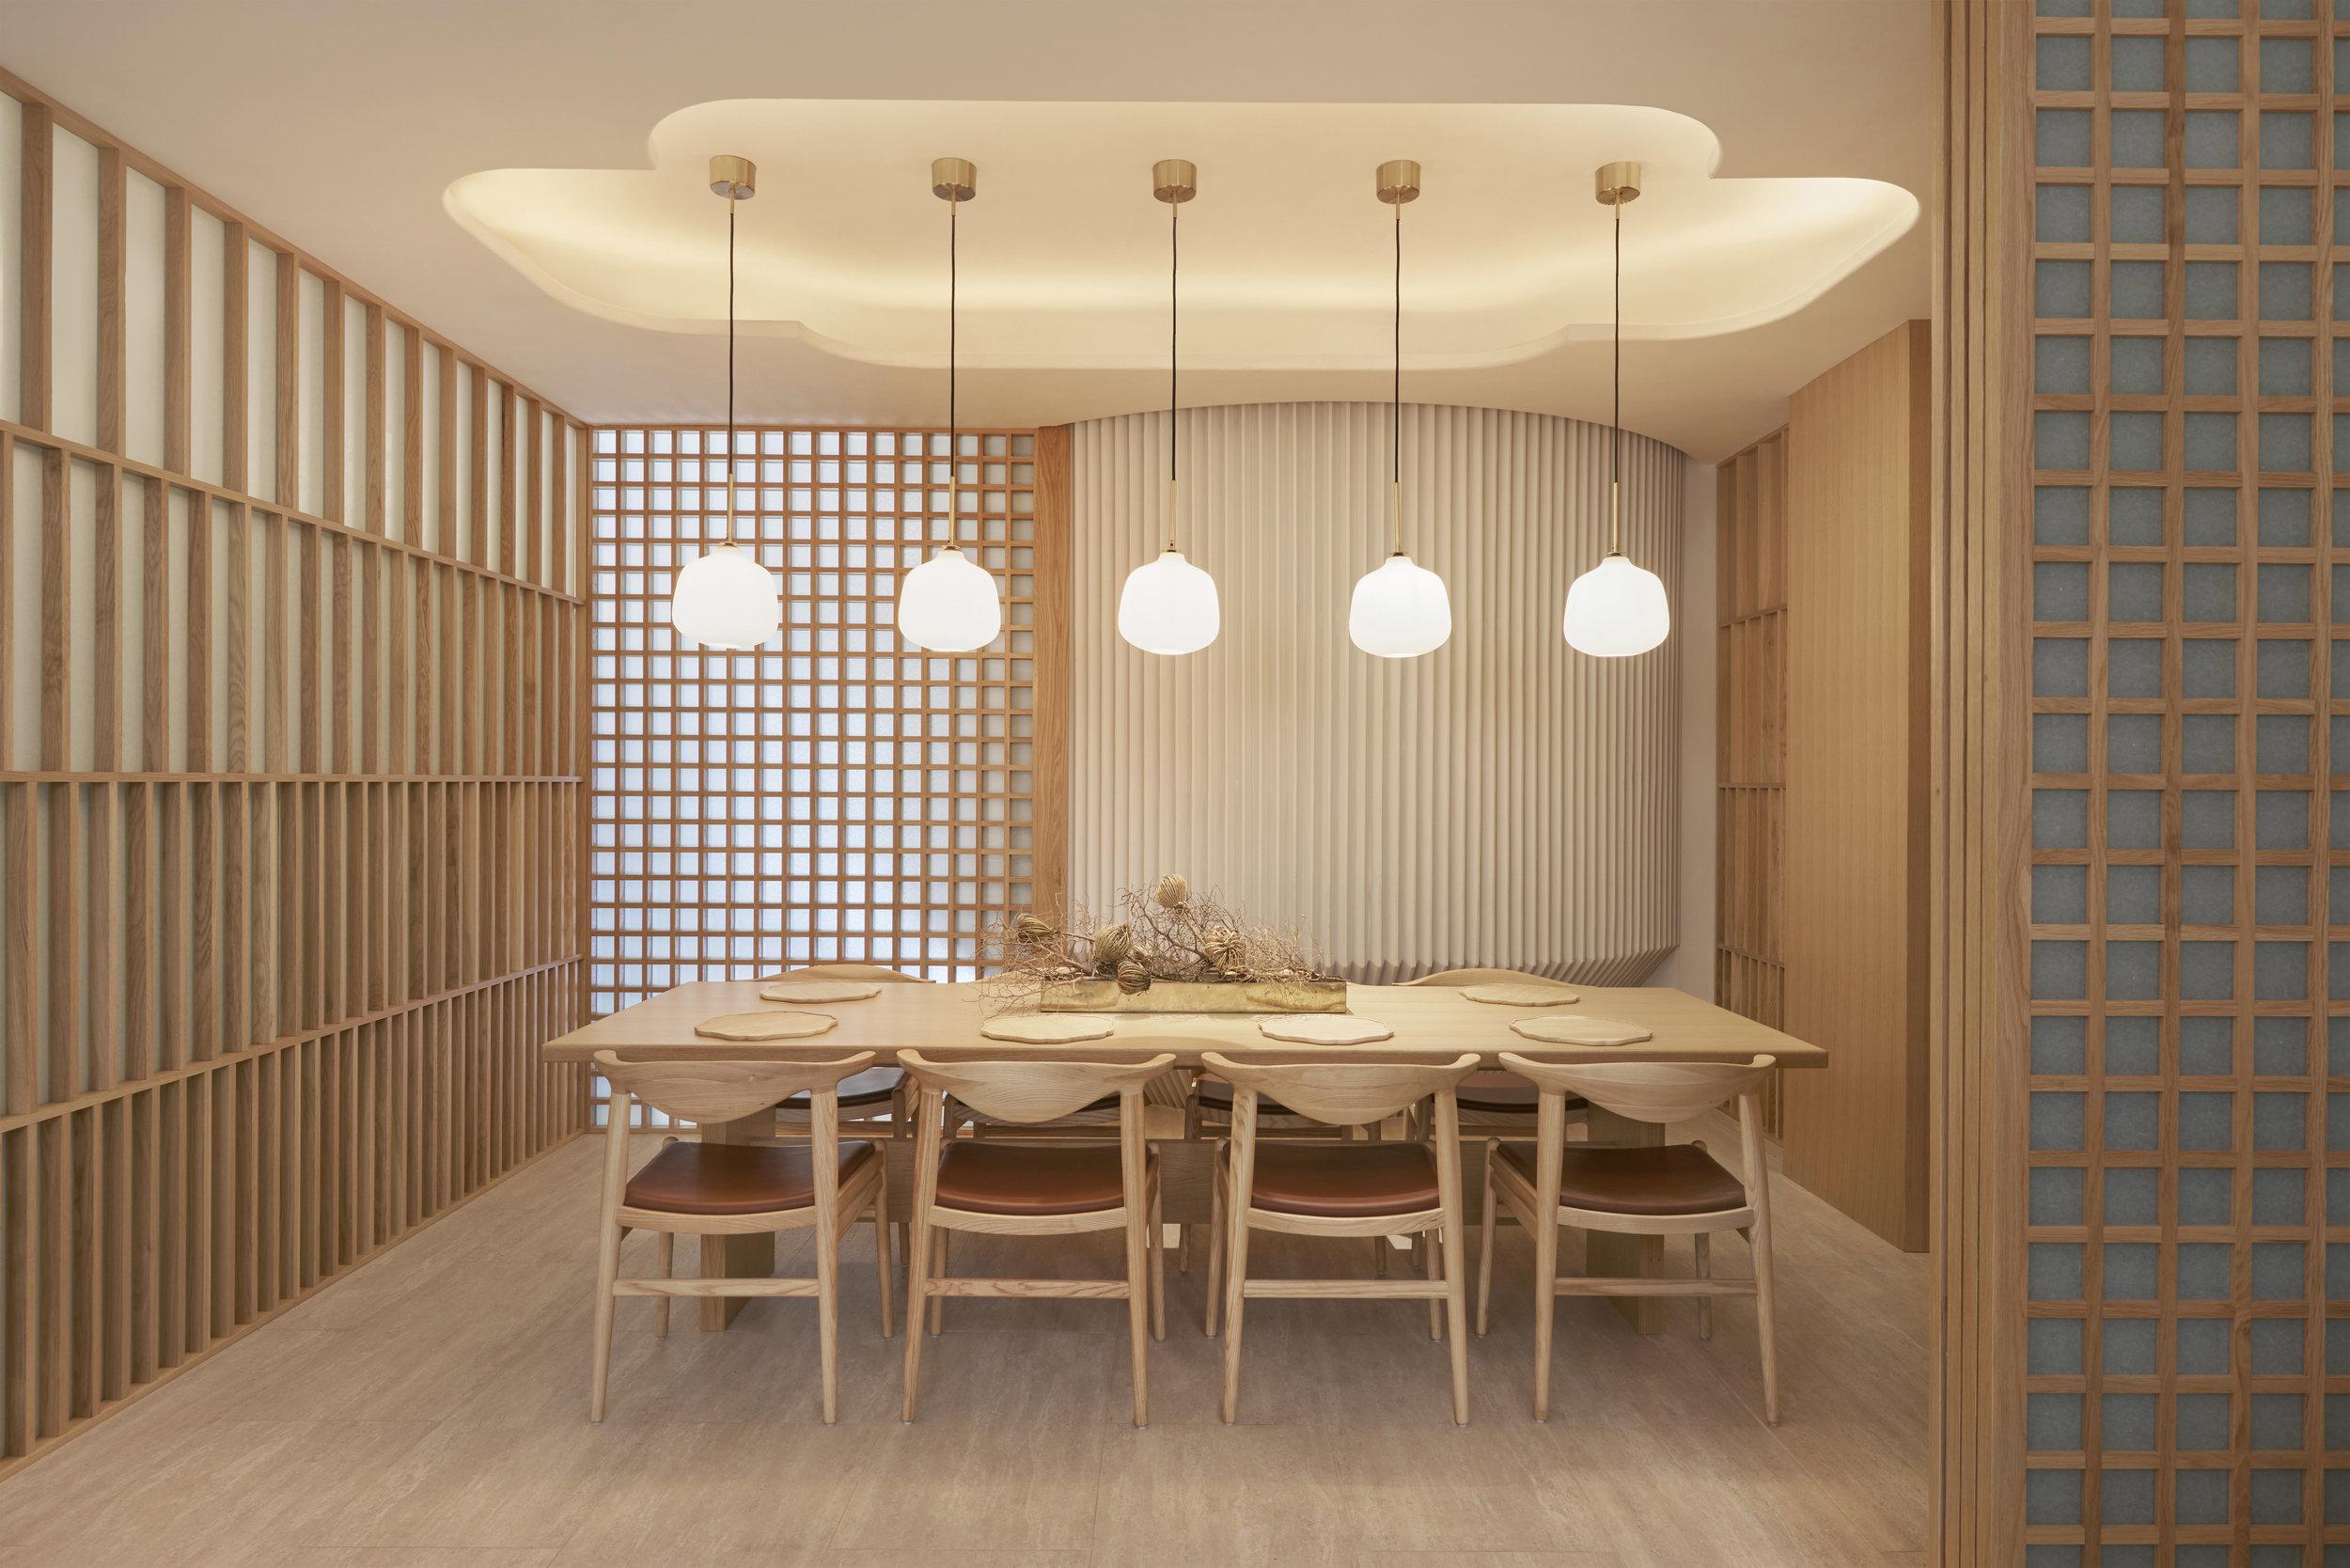 03 ESORA - Venue (Private Dining Room).jpg